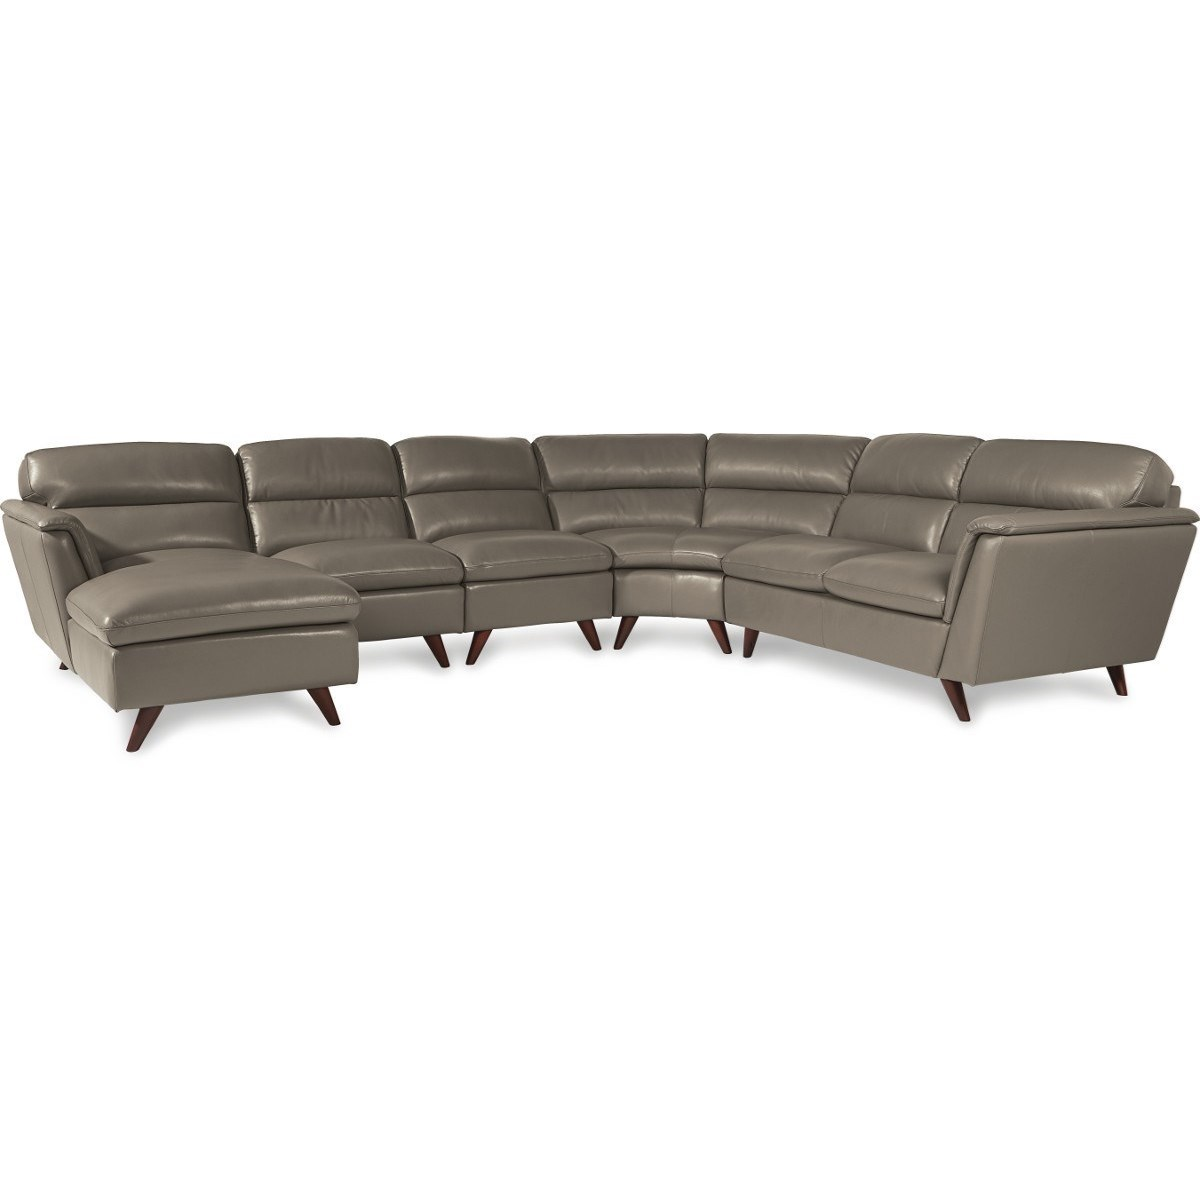 5 Pc Sectional Sofa w/ RAS Chaise